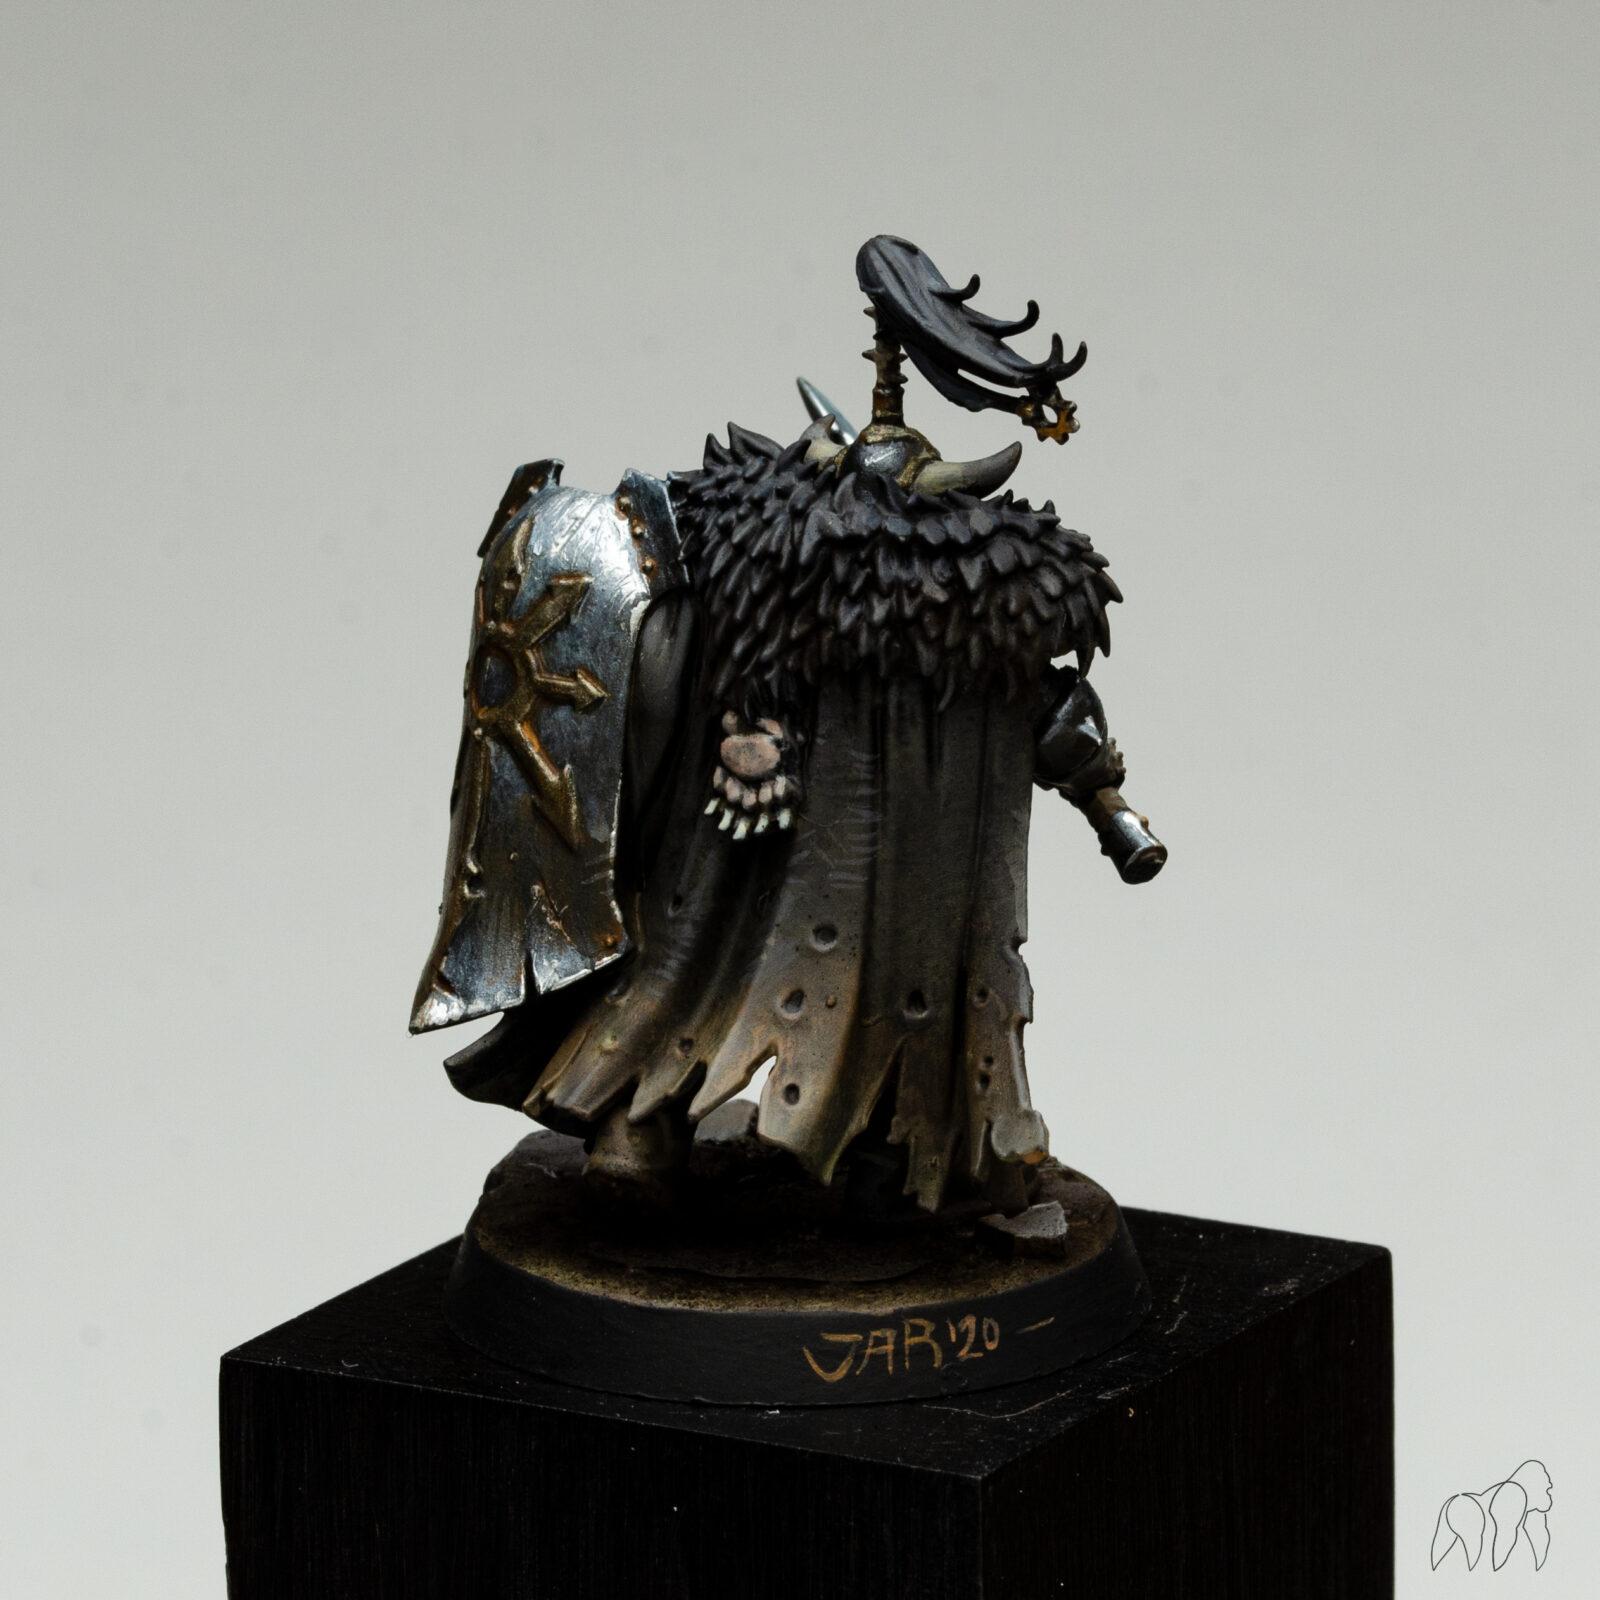 Chaoswarrior02